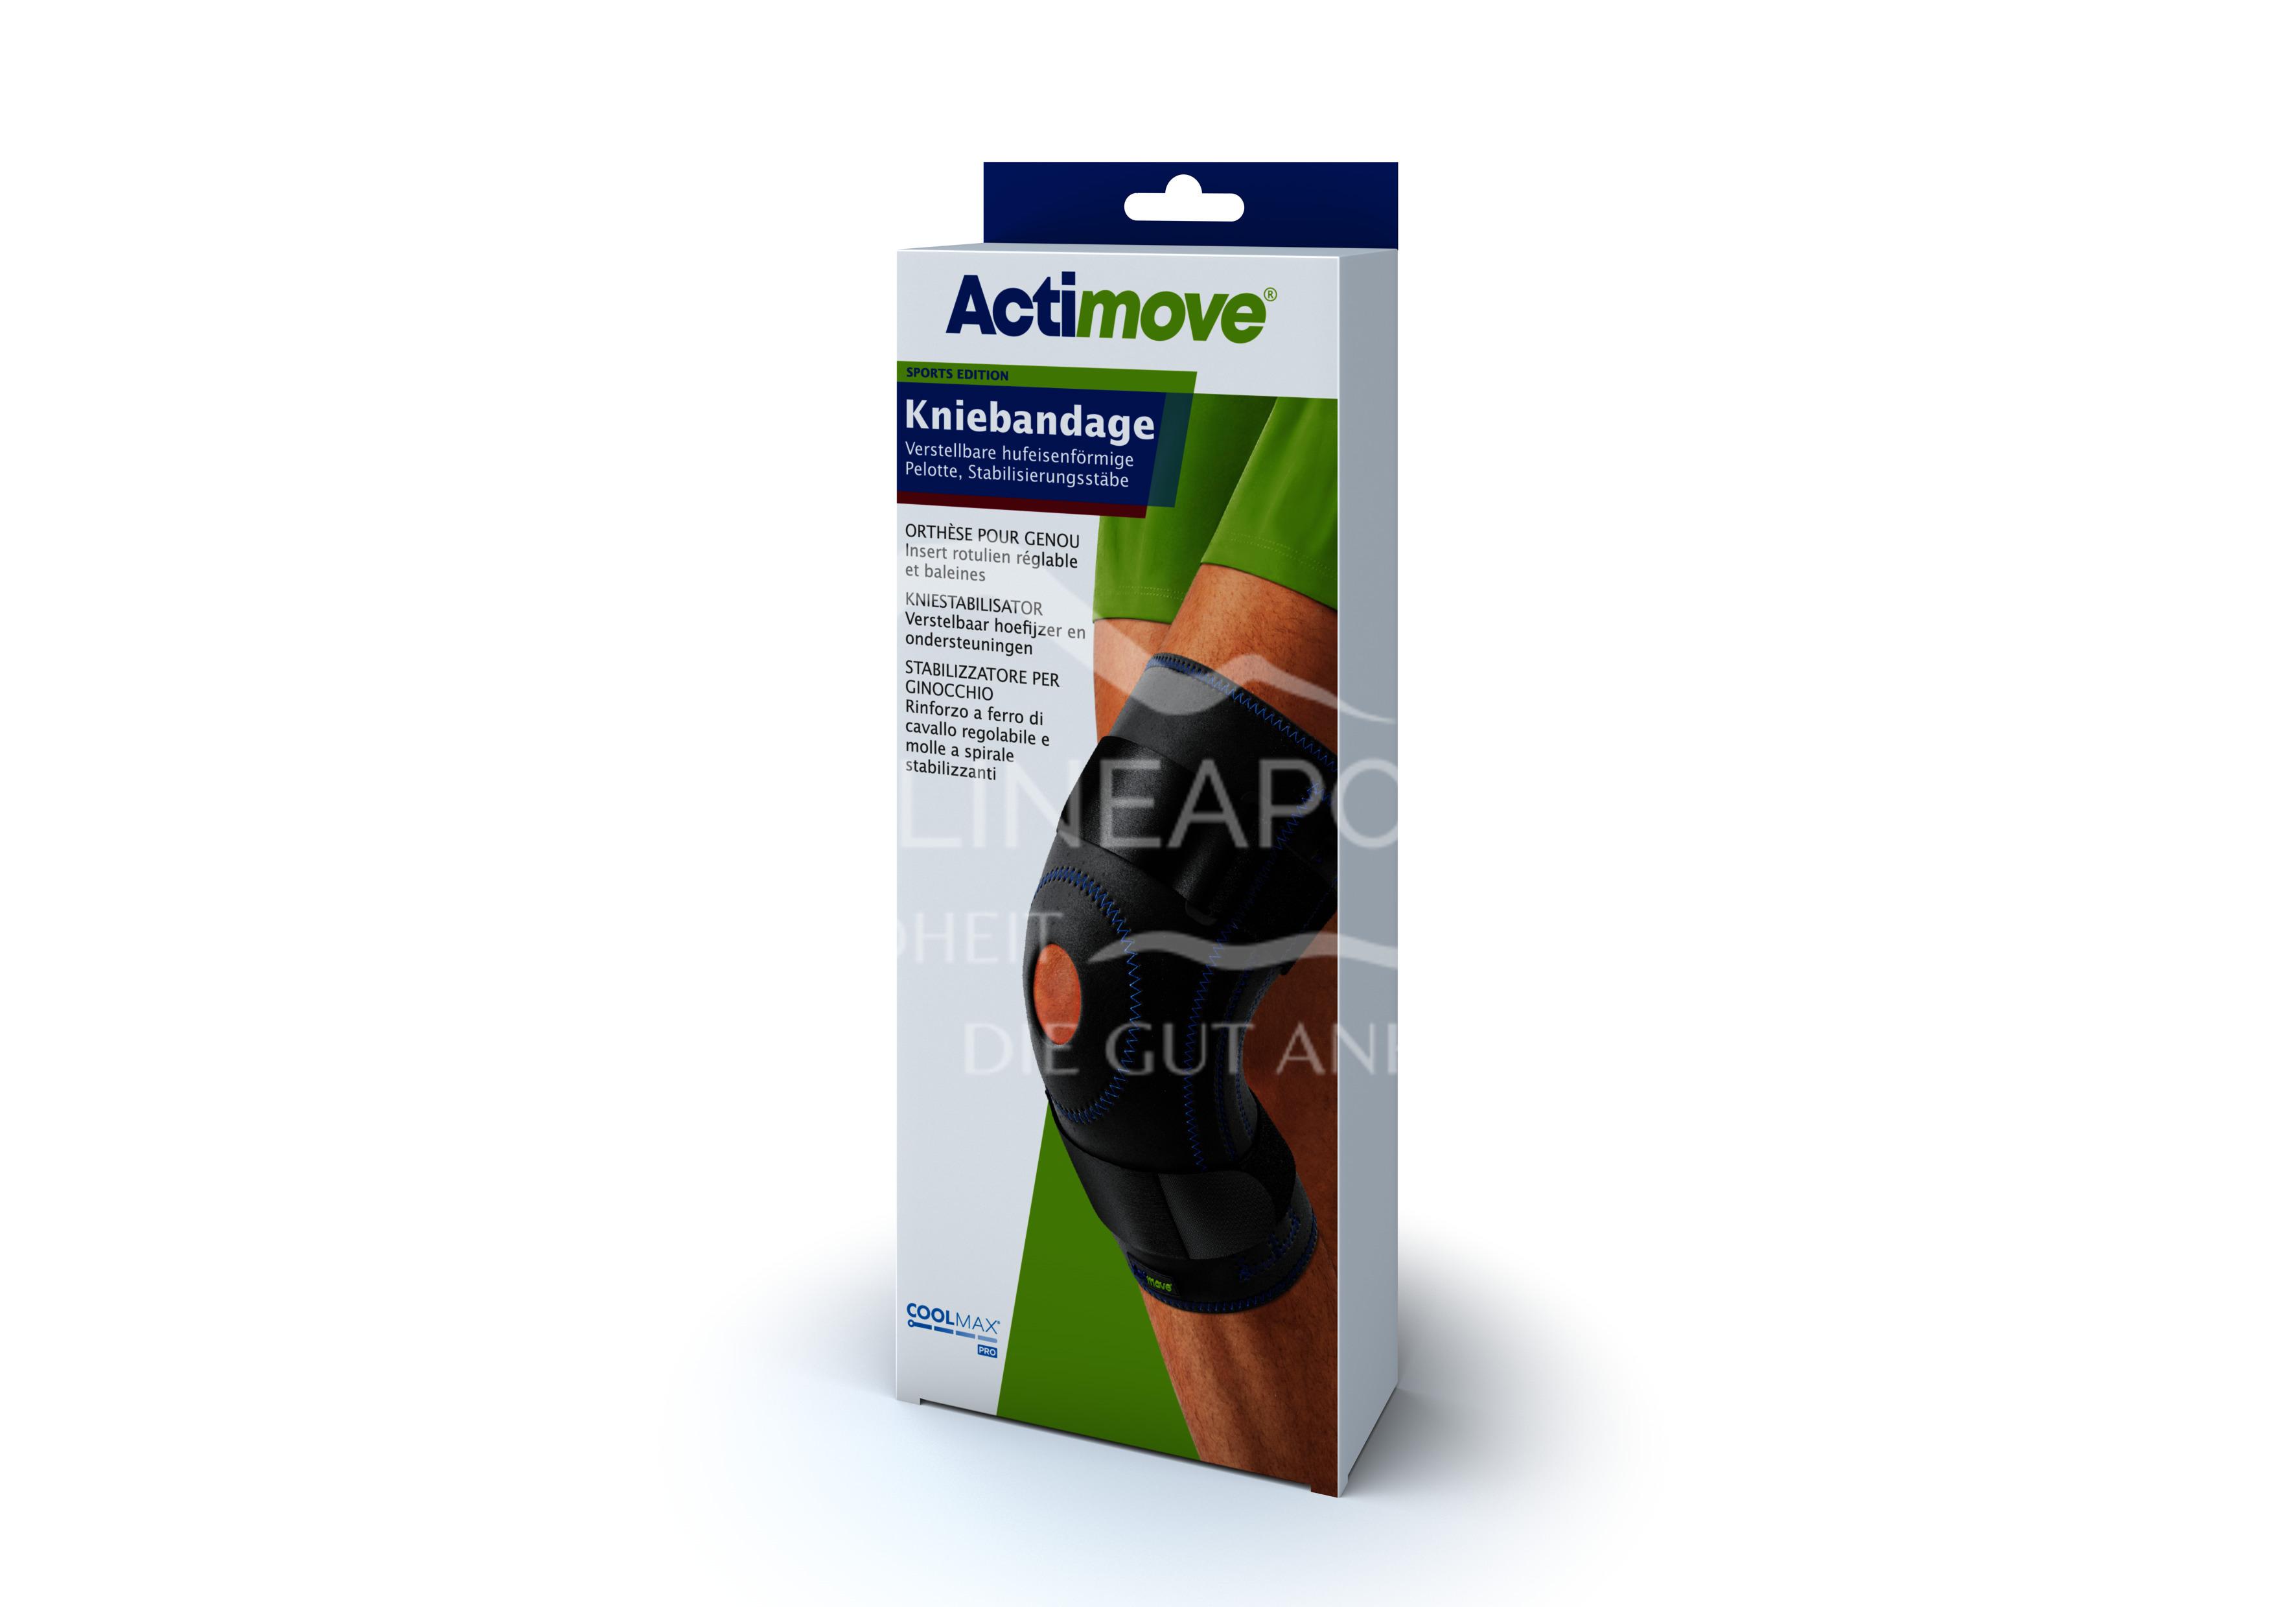 Actimove® Sport Edition Kniebandage Verstellbare hufeisenförmige Pelotte Größe L